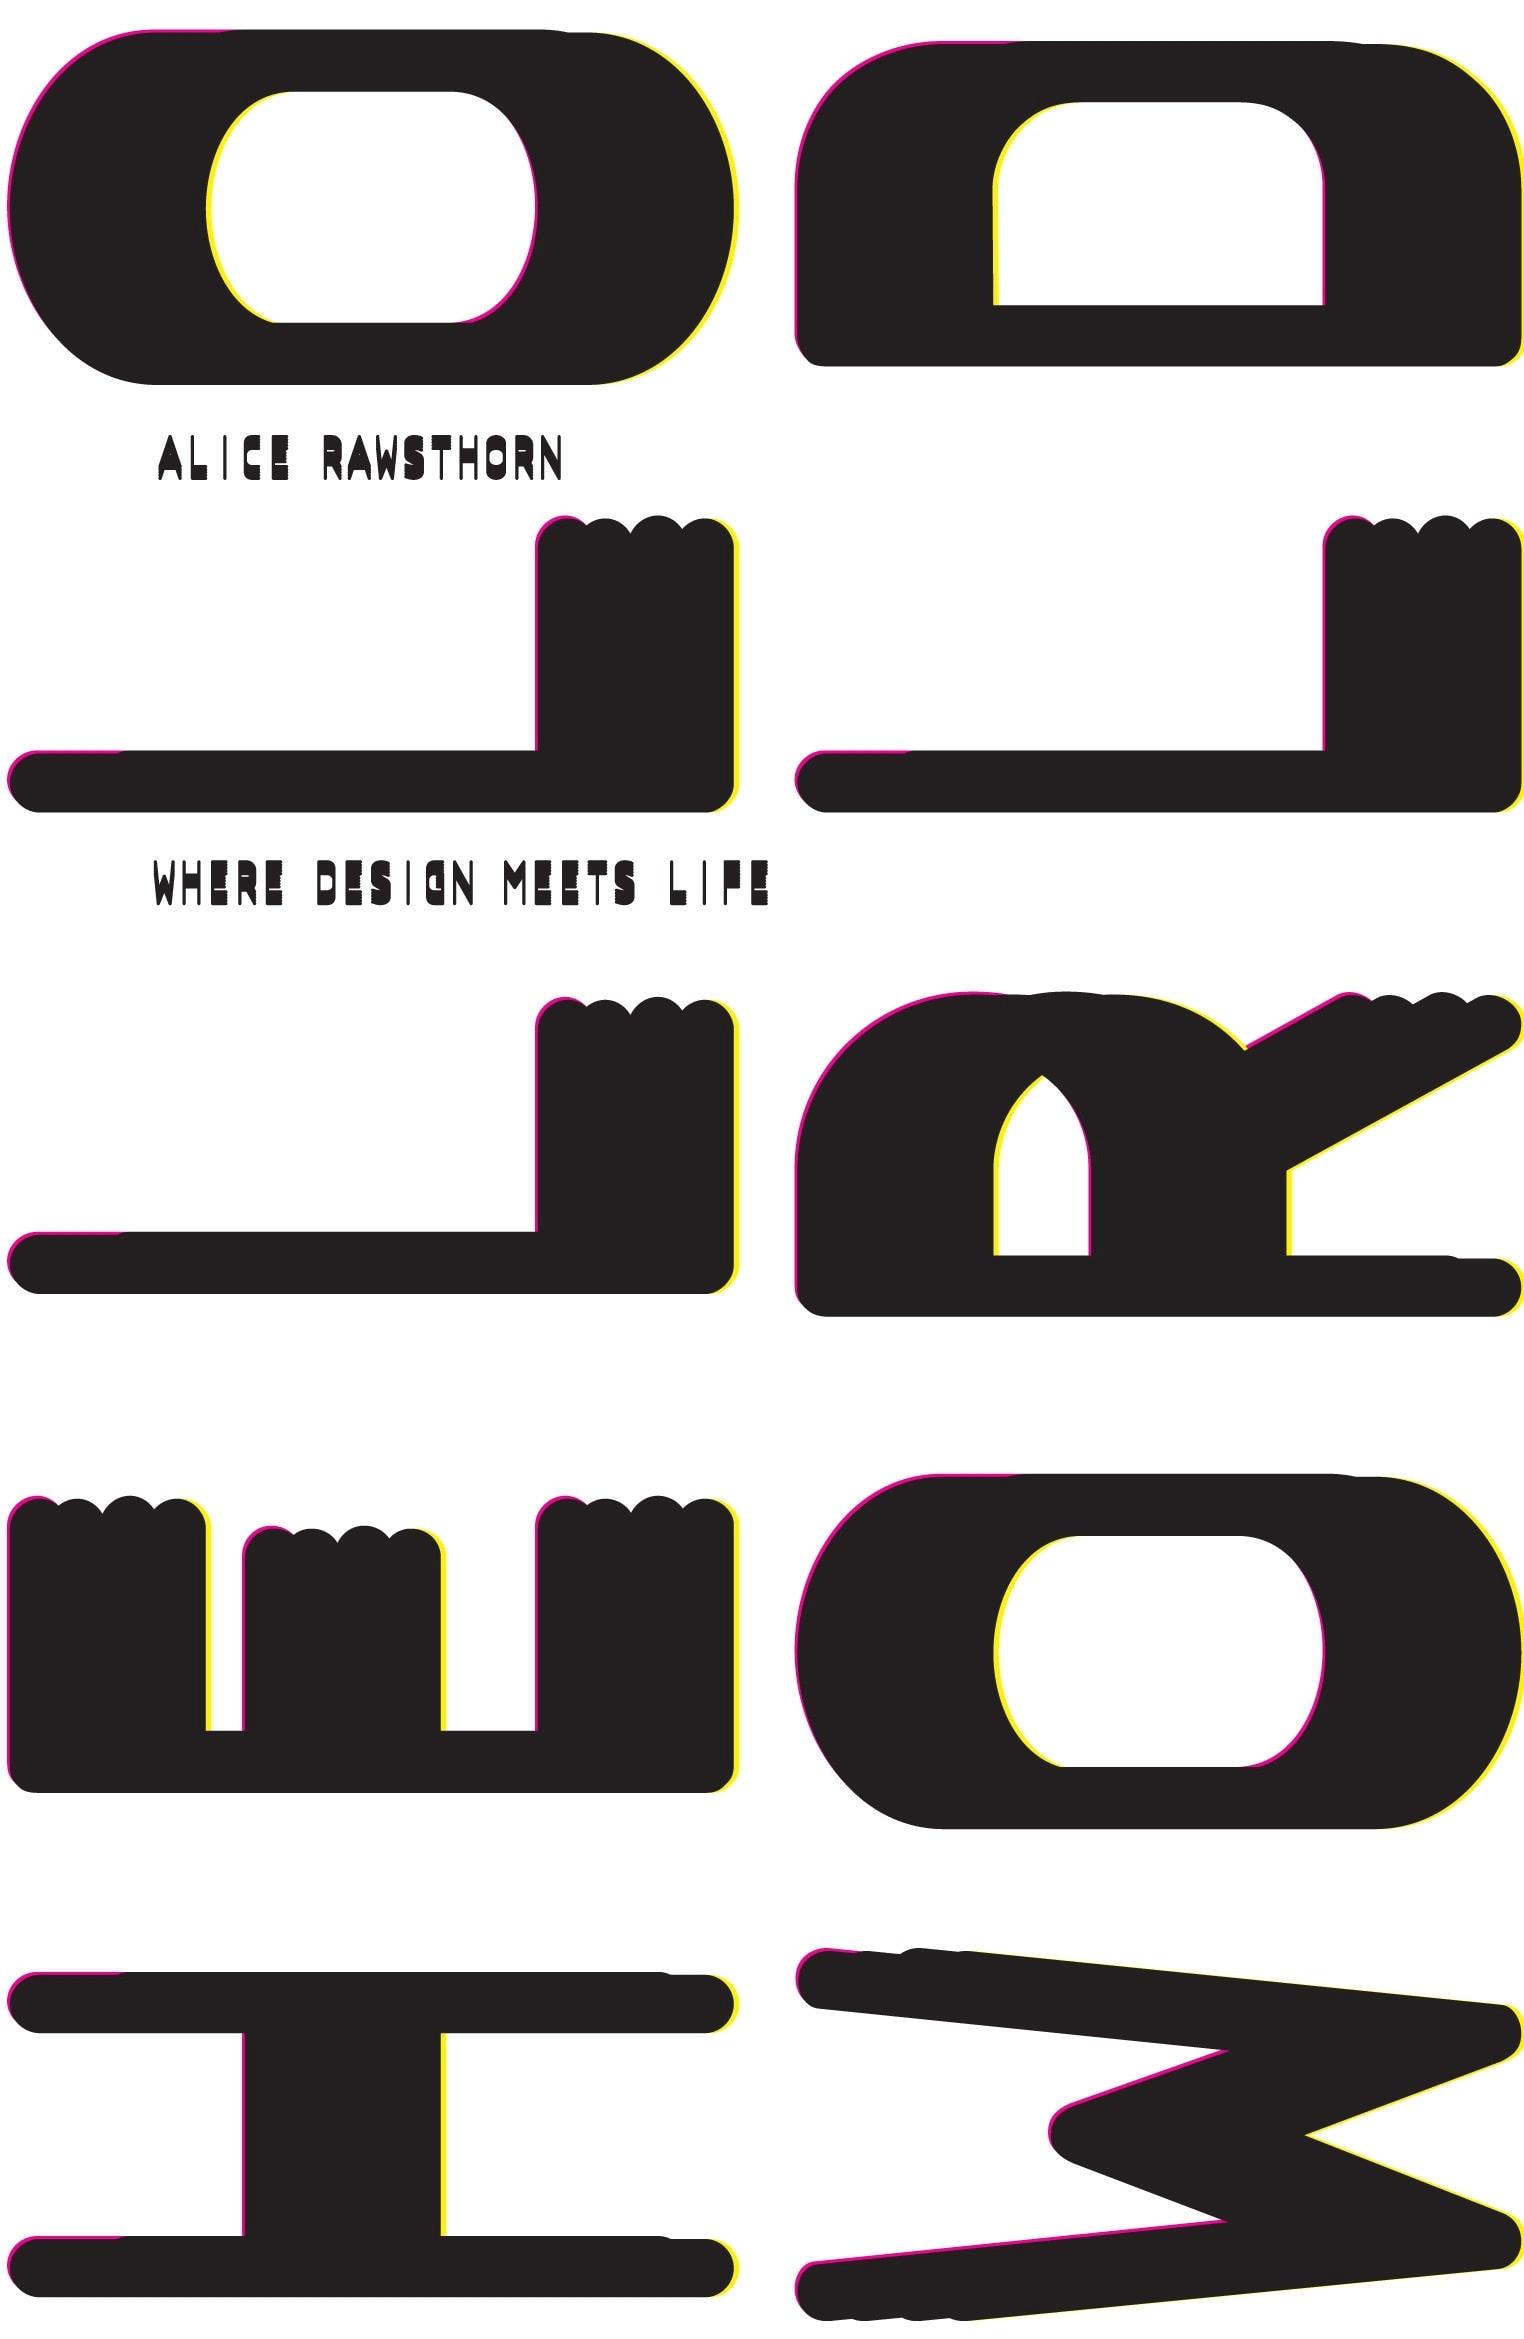 Hello World: Where Design Meets Life – Alice Rawsthorn